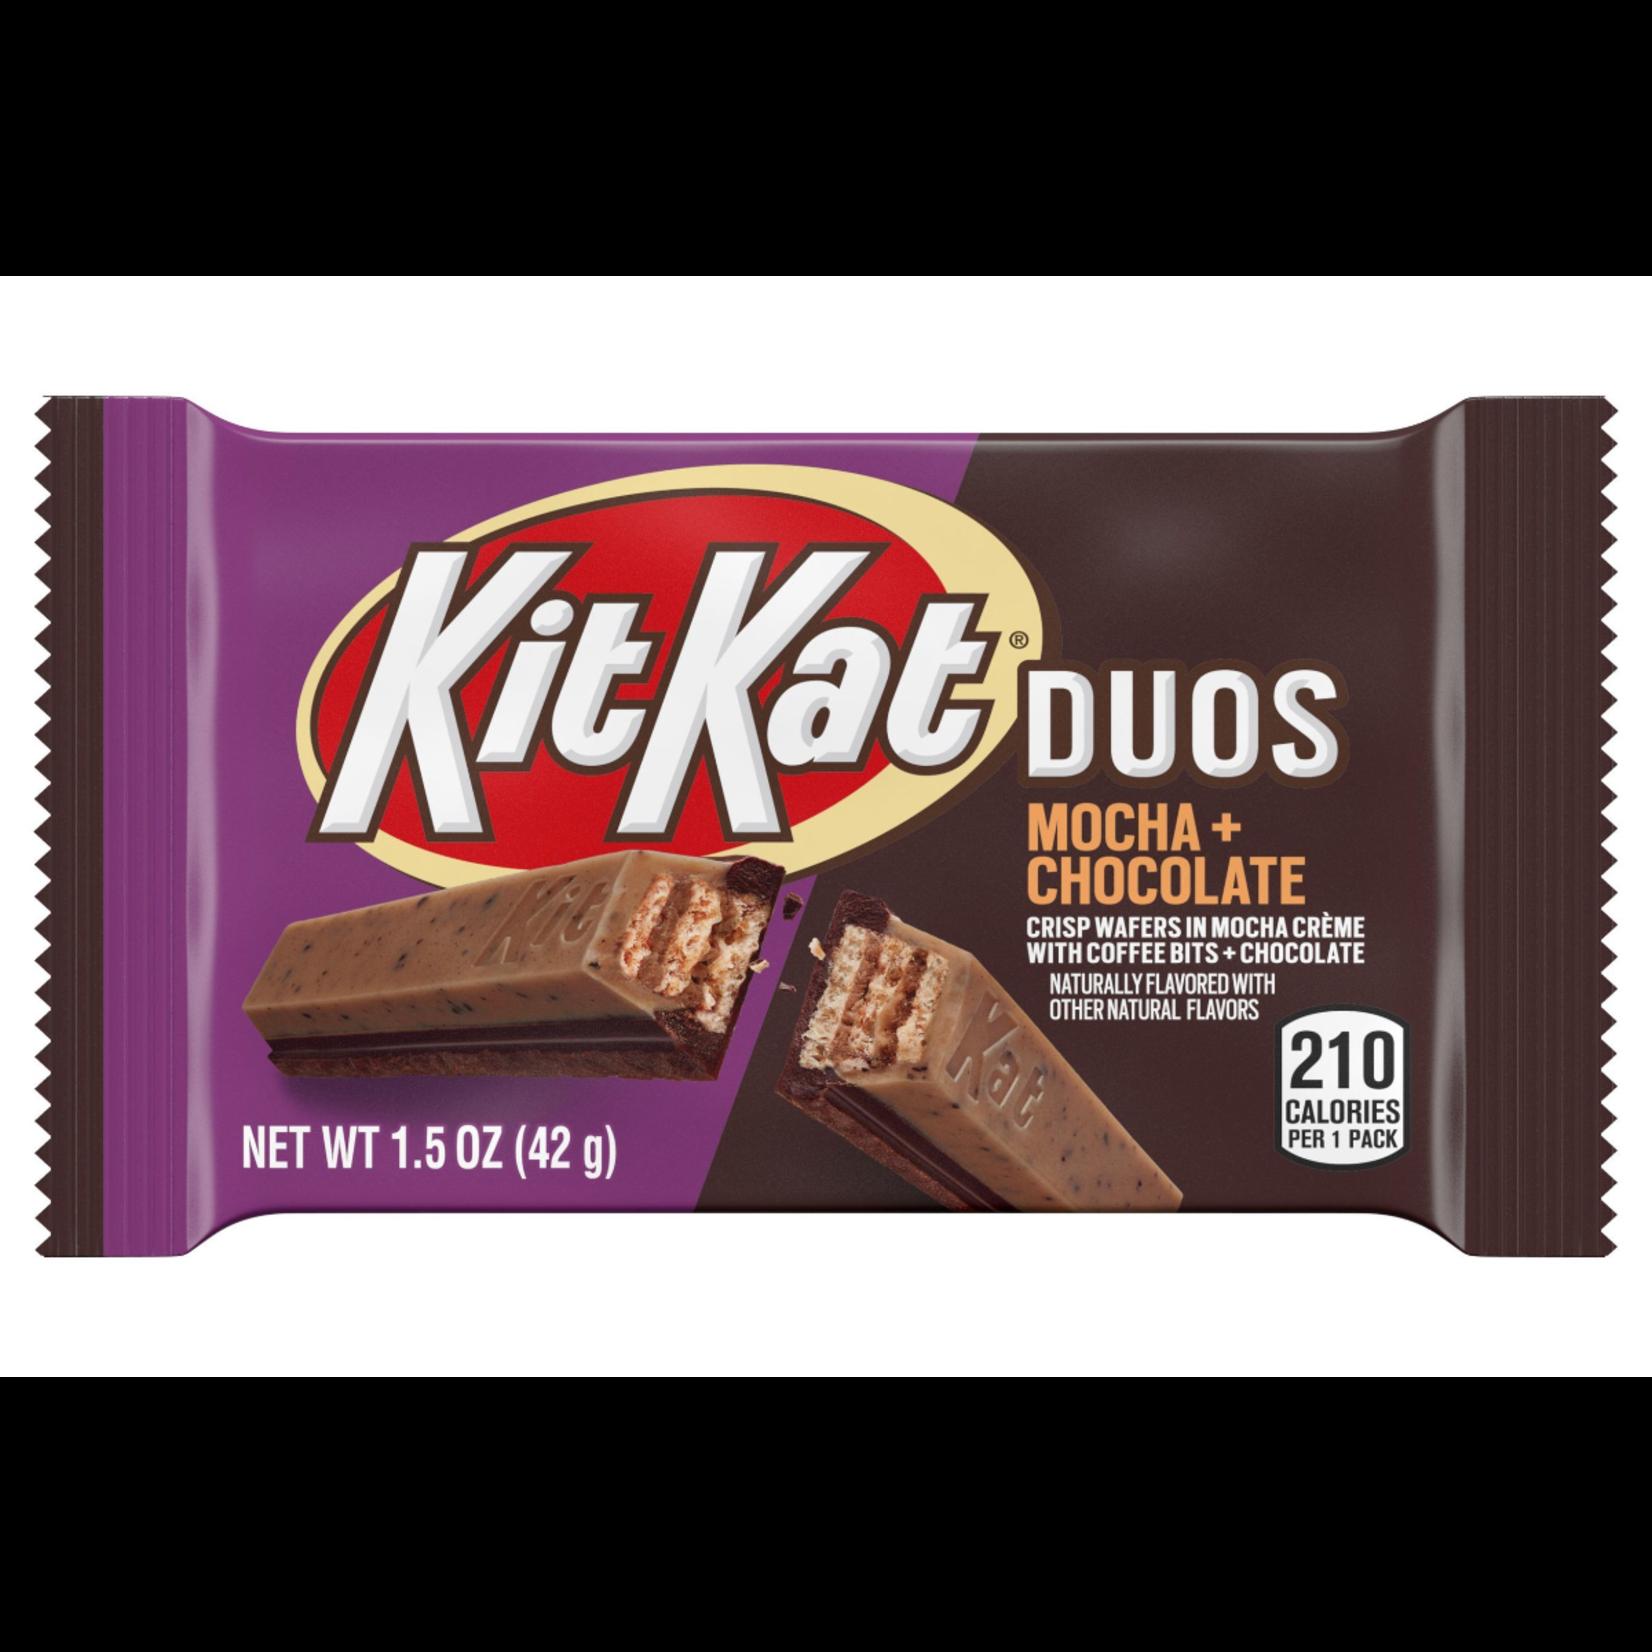 Kit Kat Duos, Mocha, 42g